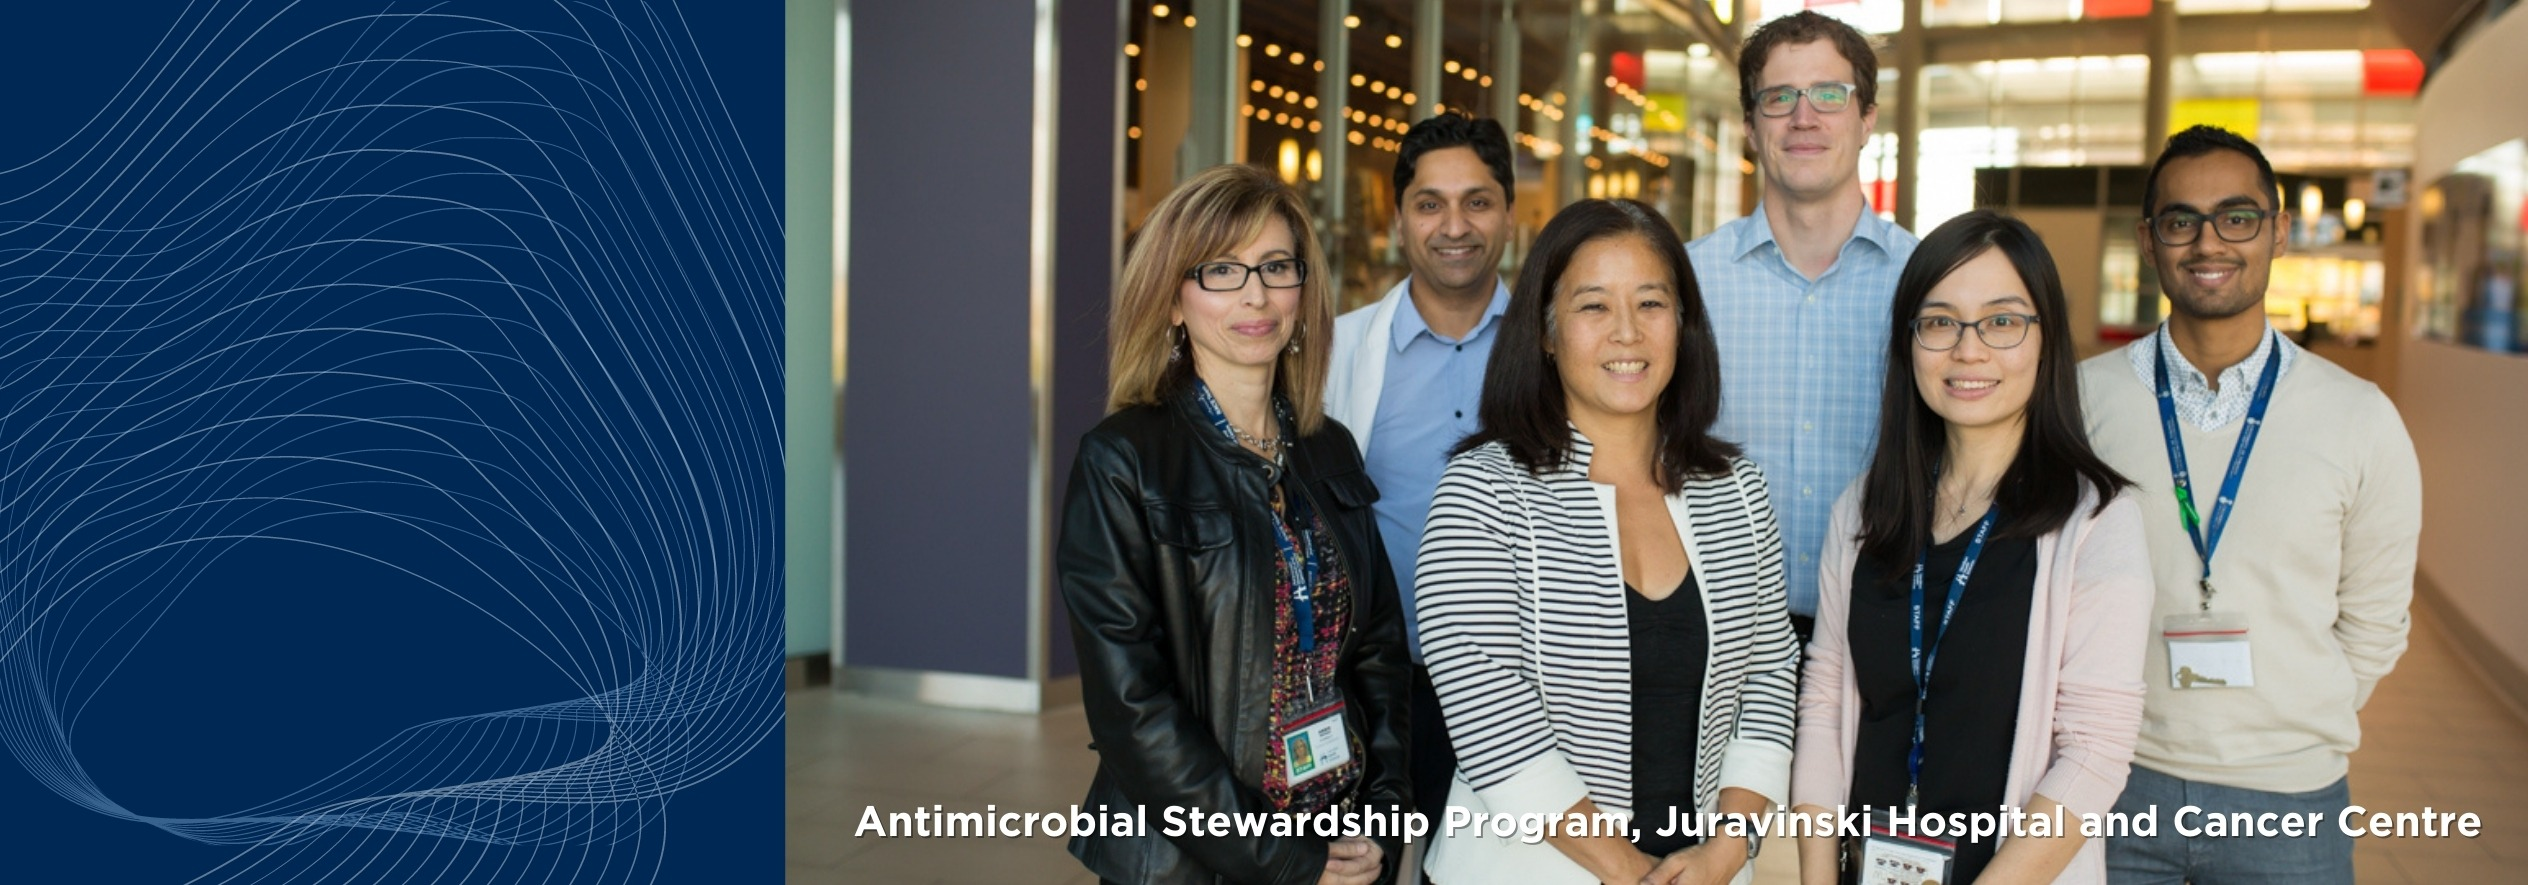 Antimicrobial Stewardship Program, Juravinski Hospital and Cancer Centre